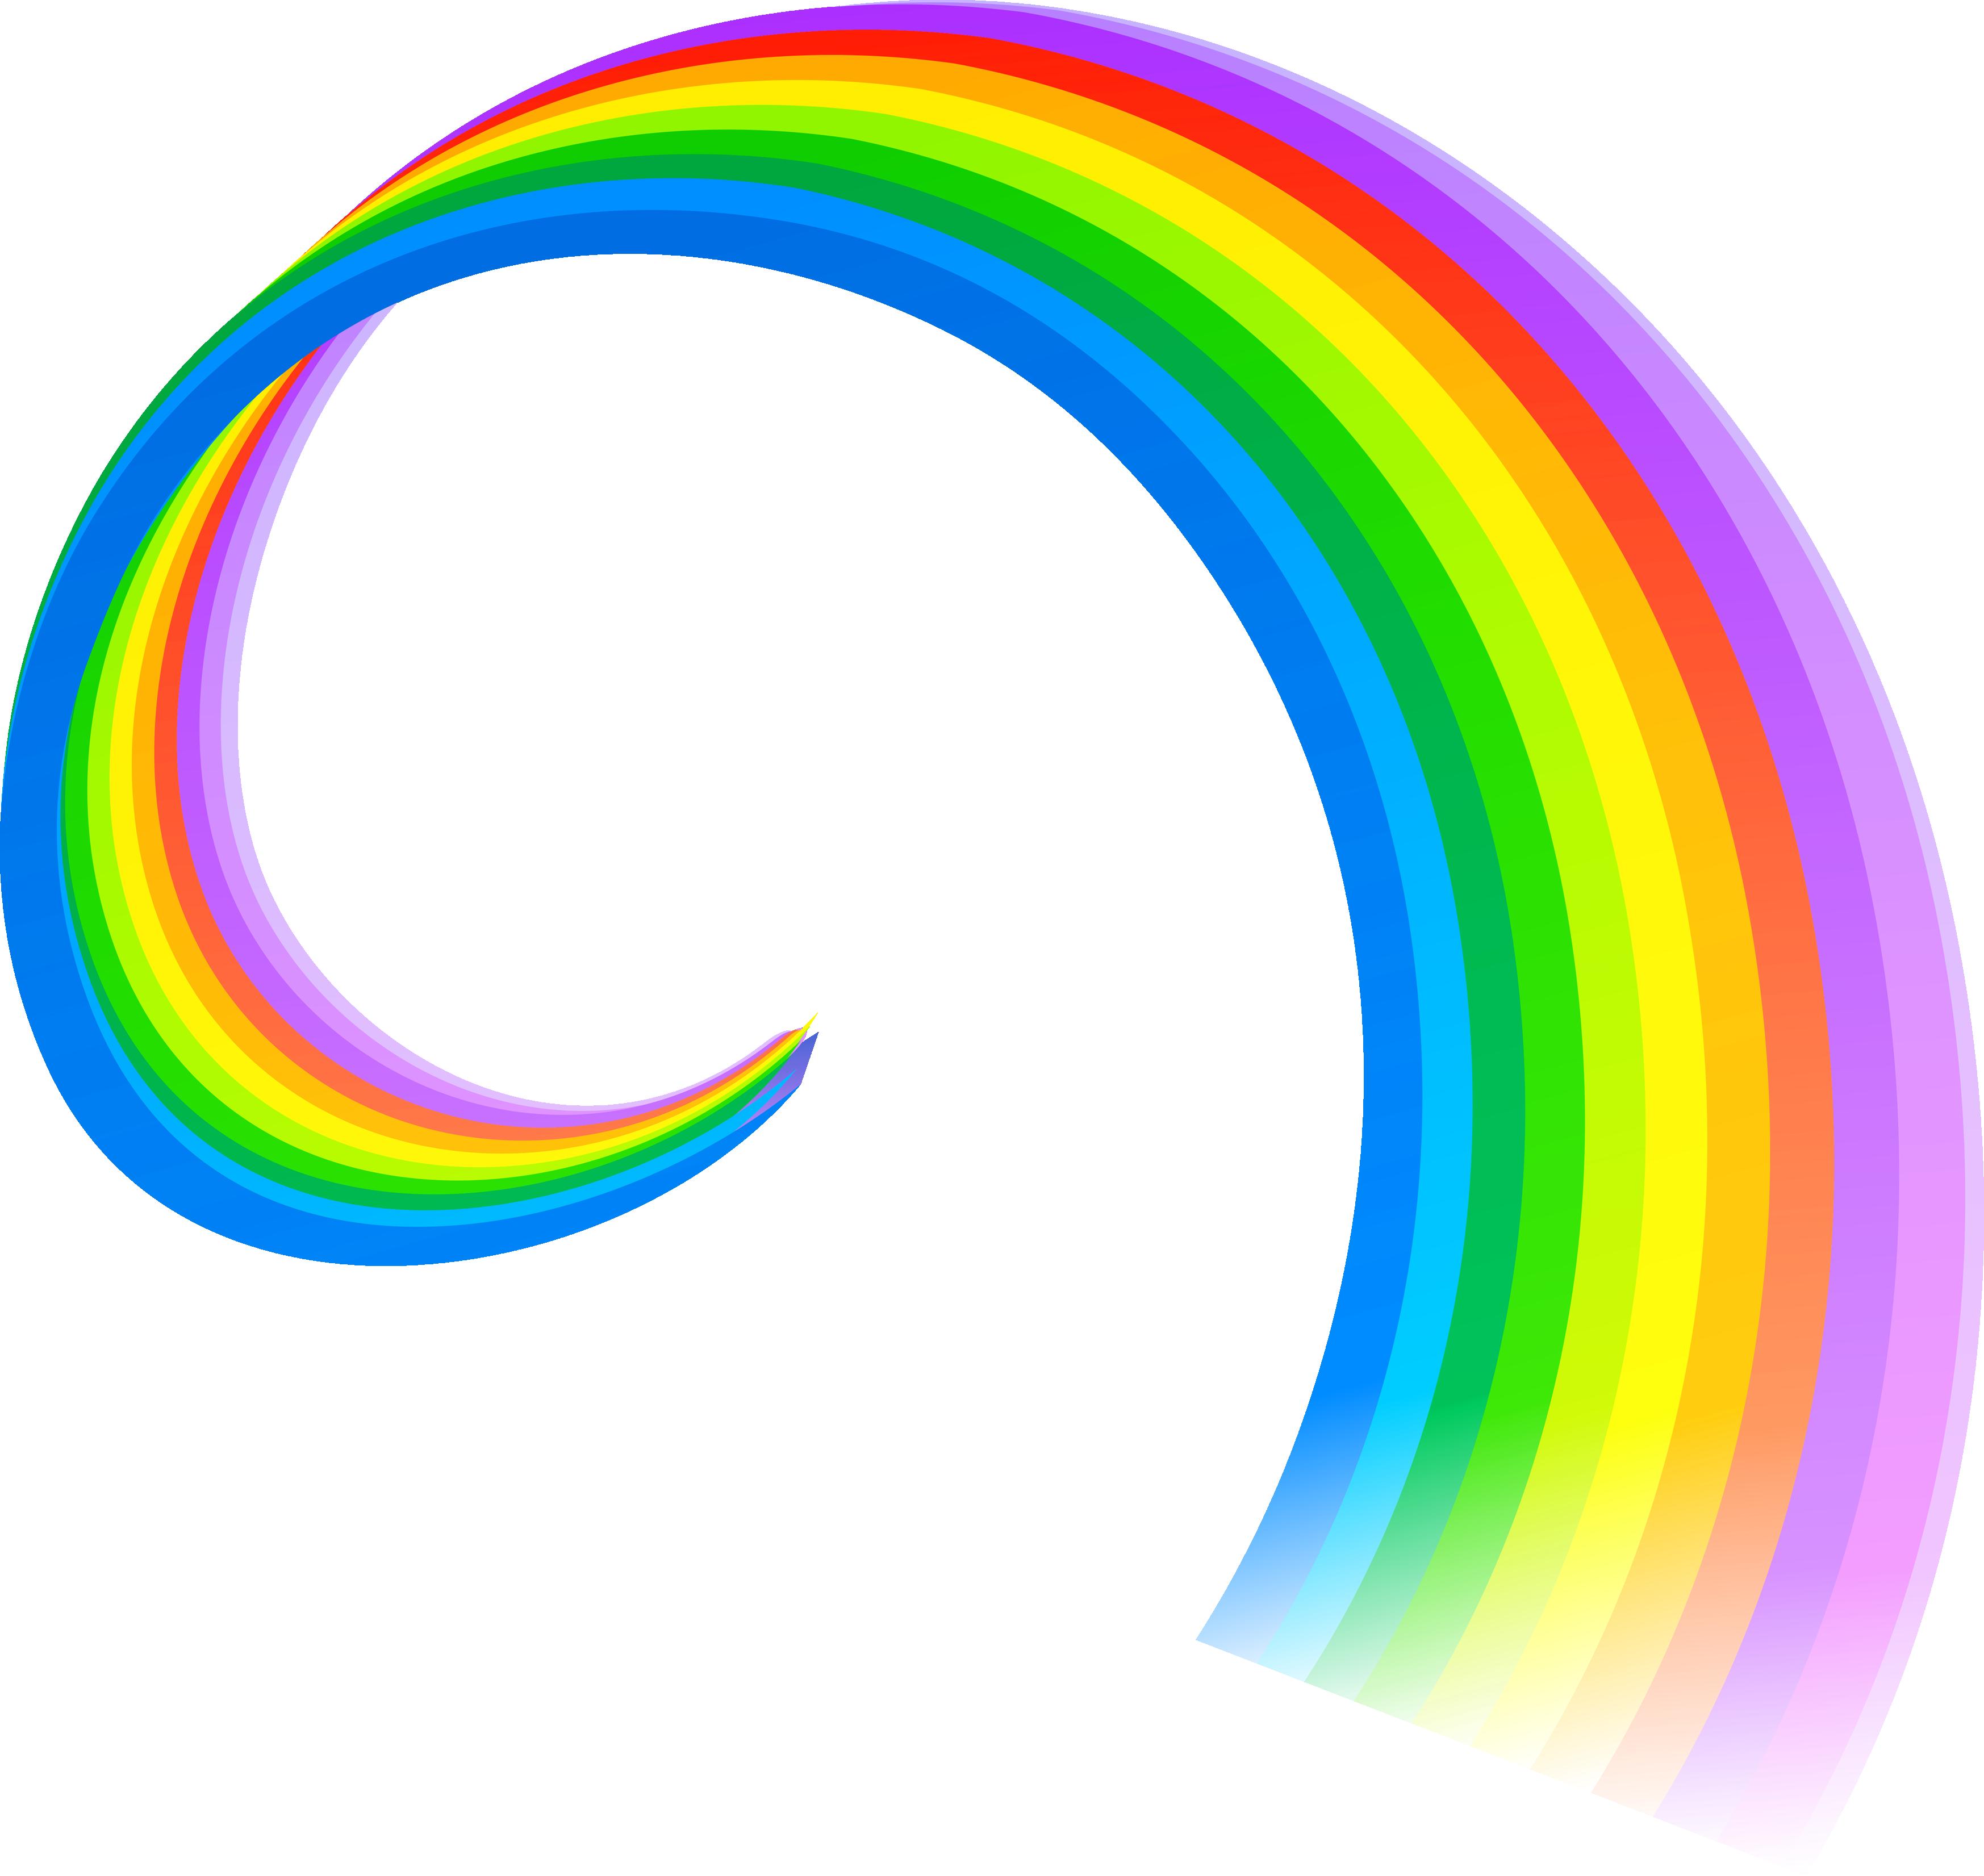 3493x3303 Rainbow And Sun Vector Transparent Stock Large